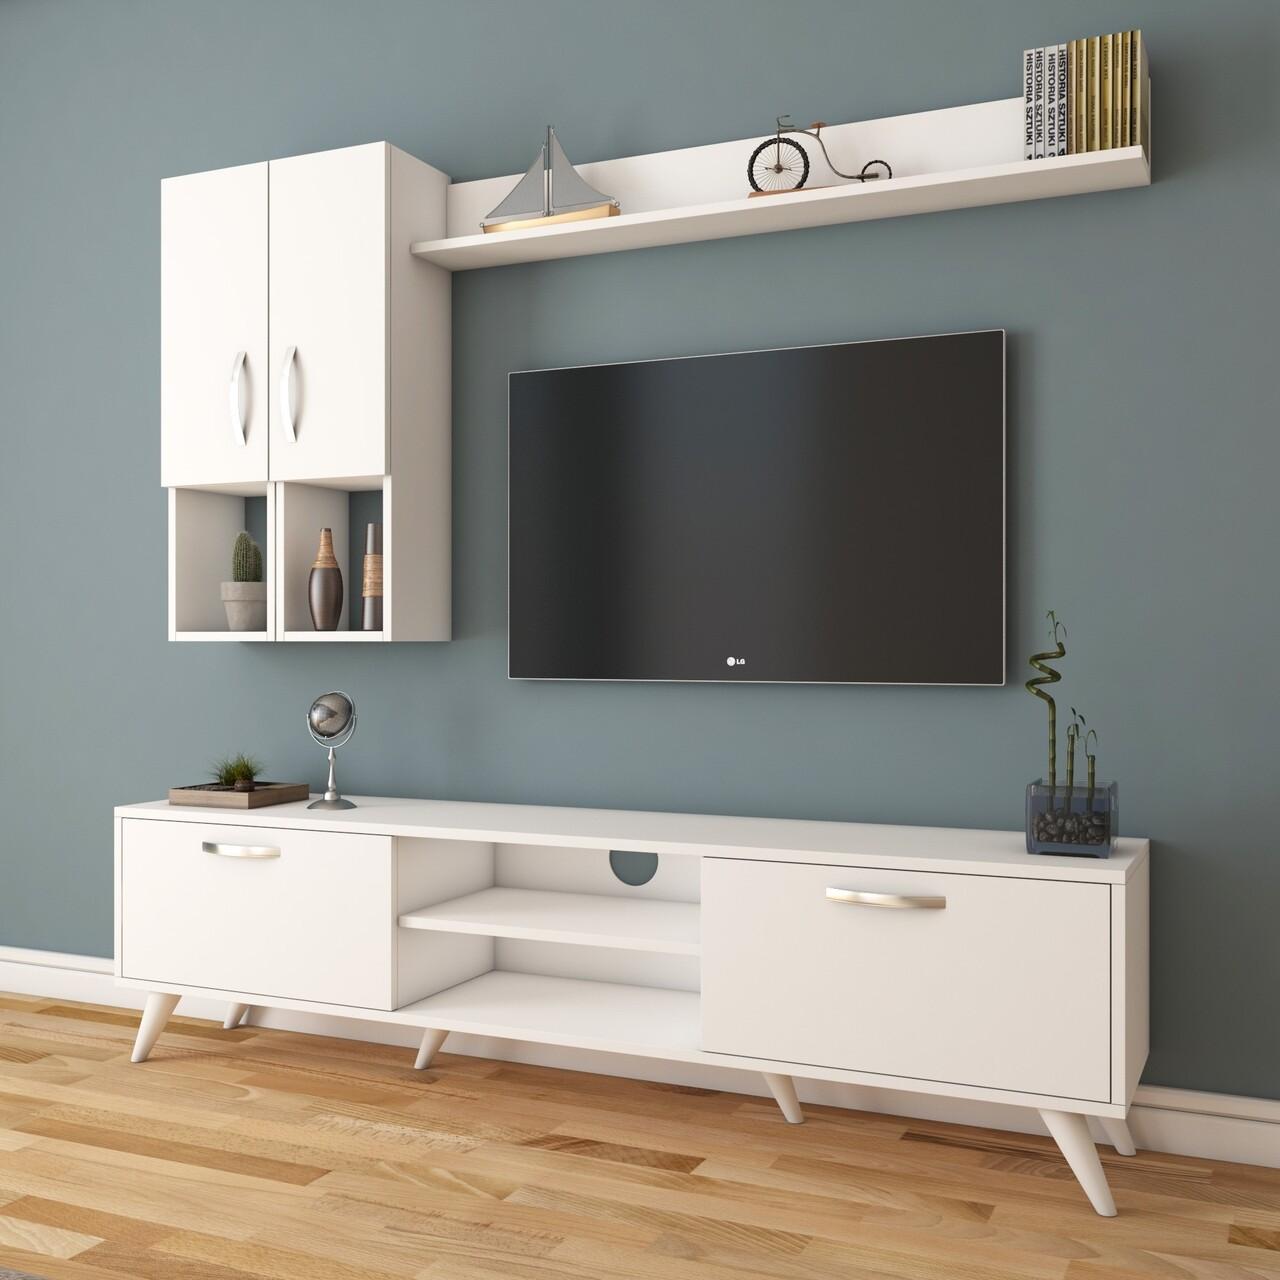 Comoda TV cu raft de perete si 2 cabinete M35 - 297, Wren, 180 x 35 x 48.6 cm/133 cm, white